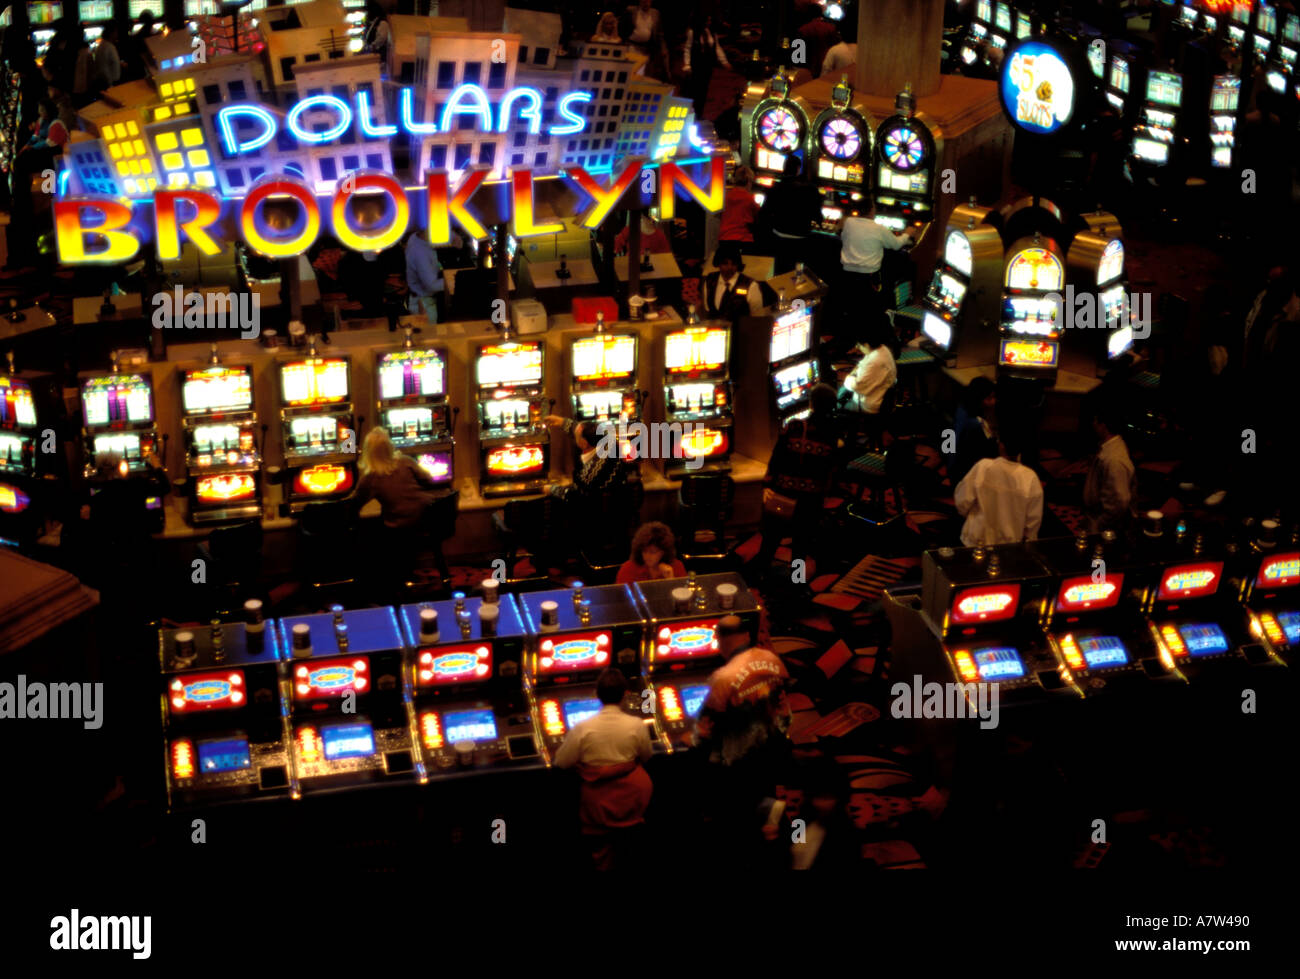 Gratis online slots - spil 500+ gratis Vegas slots